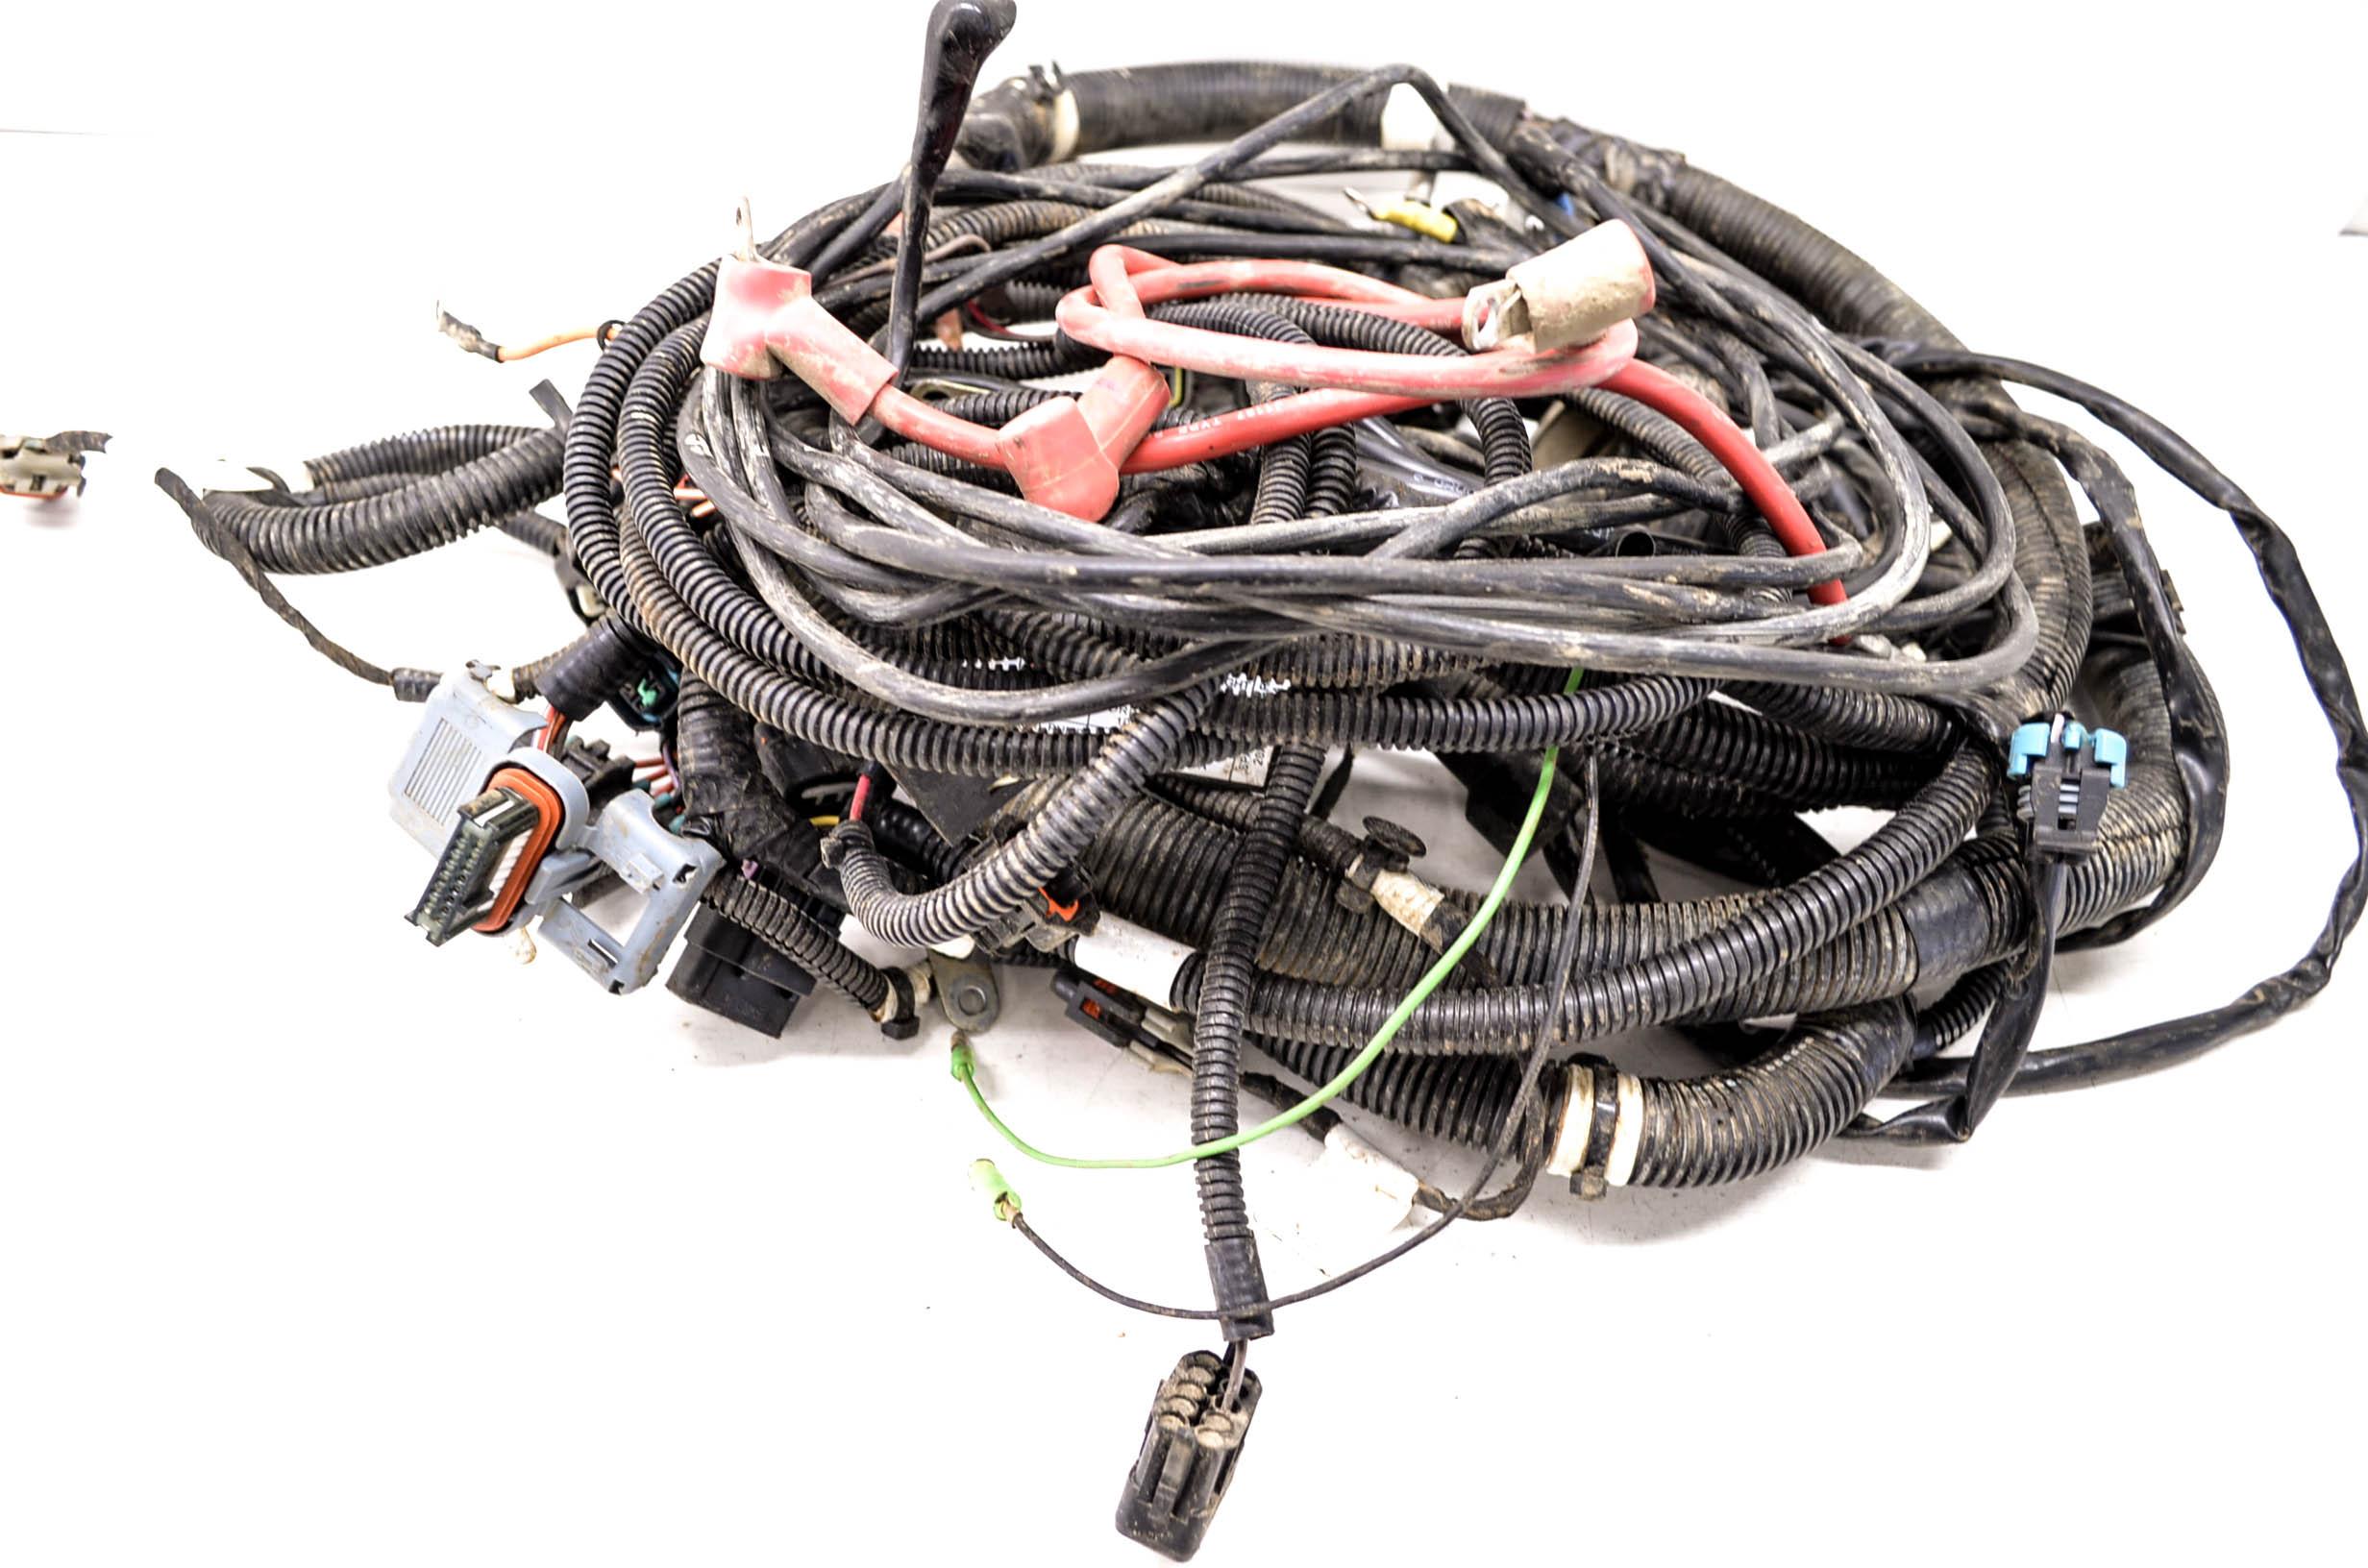 4x4 Harness | Wiring Liry on